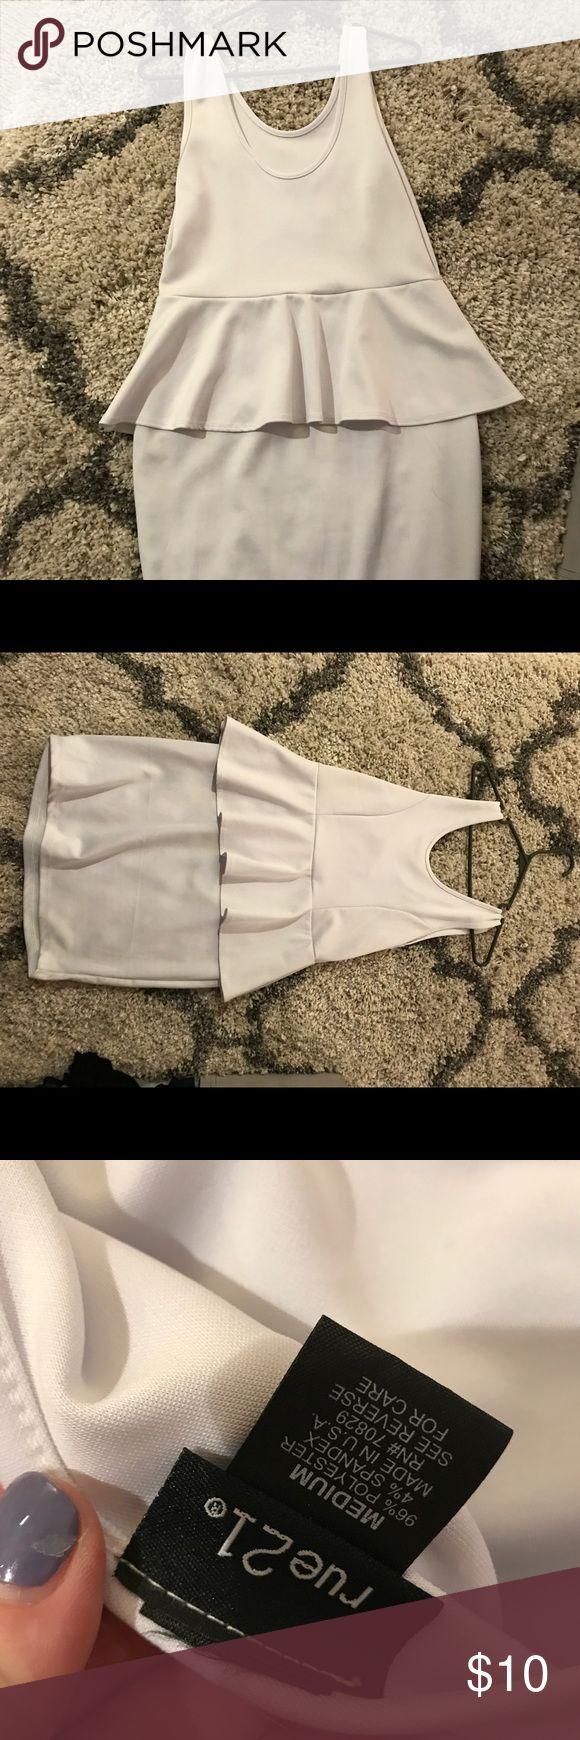 Never worn white peplum dress. Super cute- perfect for a bachelorette! Rue 21 Dresses Mini